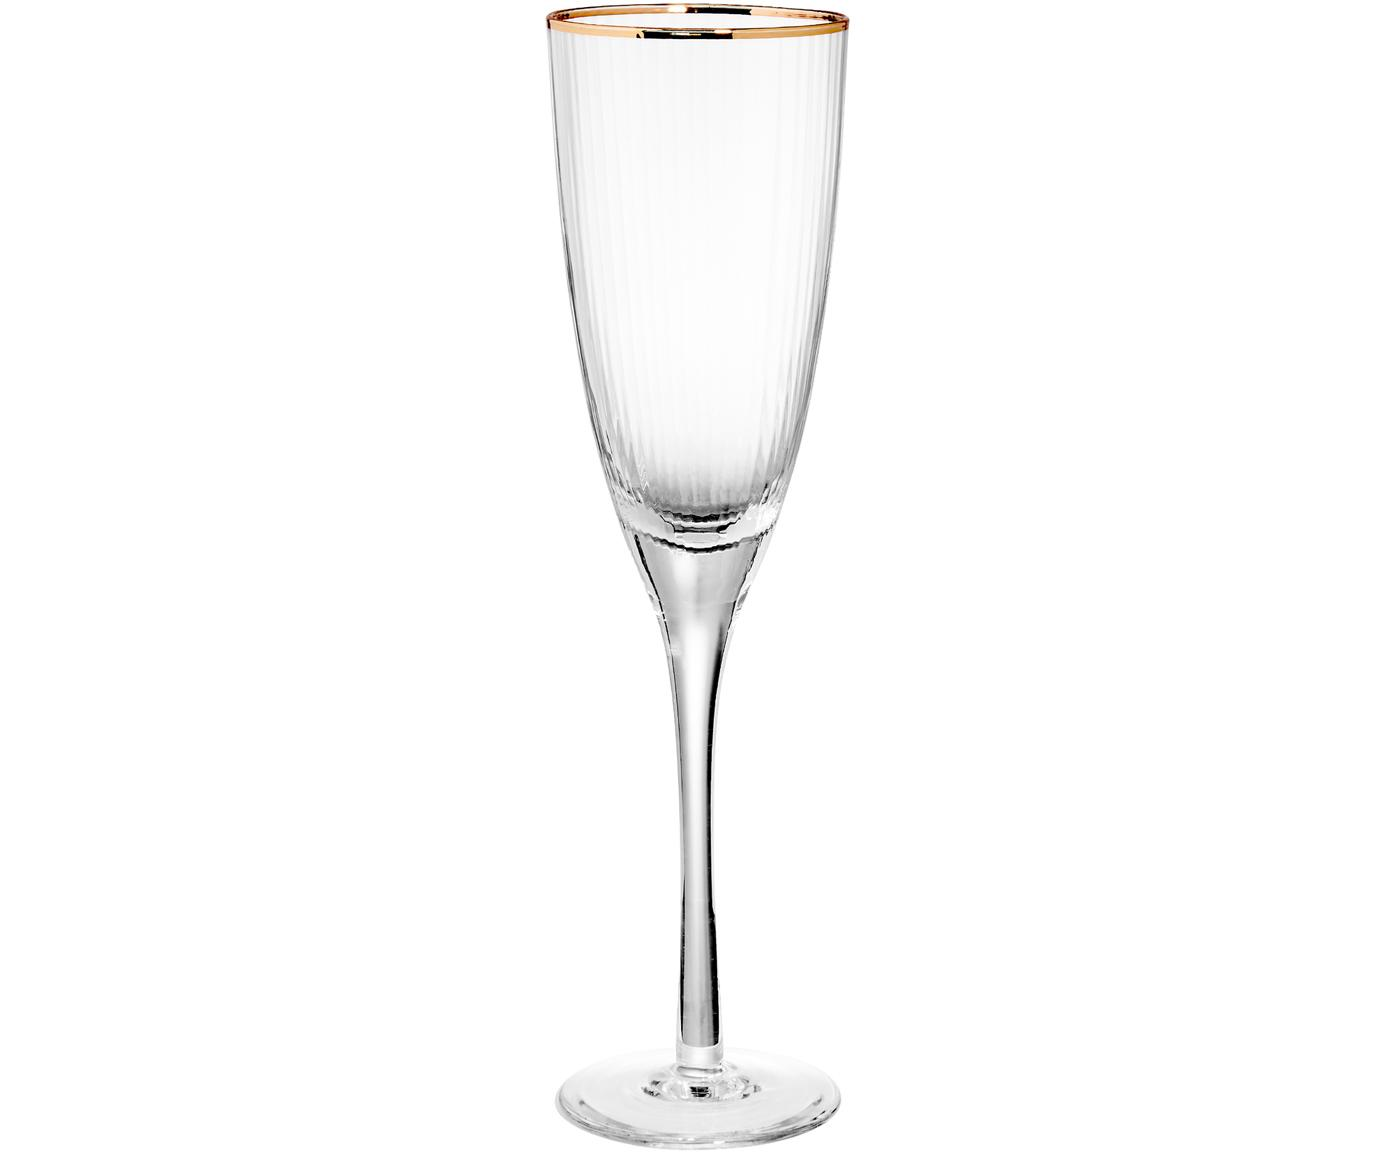 Flute champagne Golden Twenties 4 pz, Vetro, Trasparente, Ø 7 x Alt. 26 cm